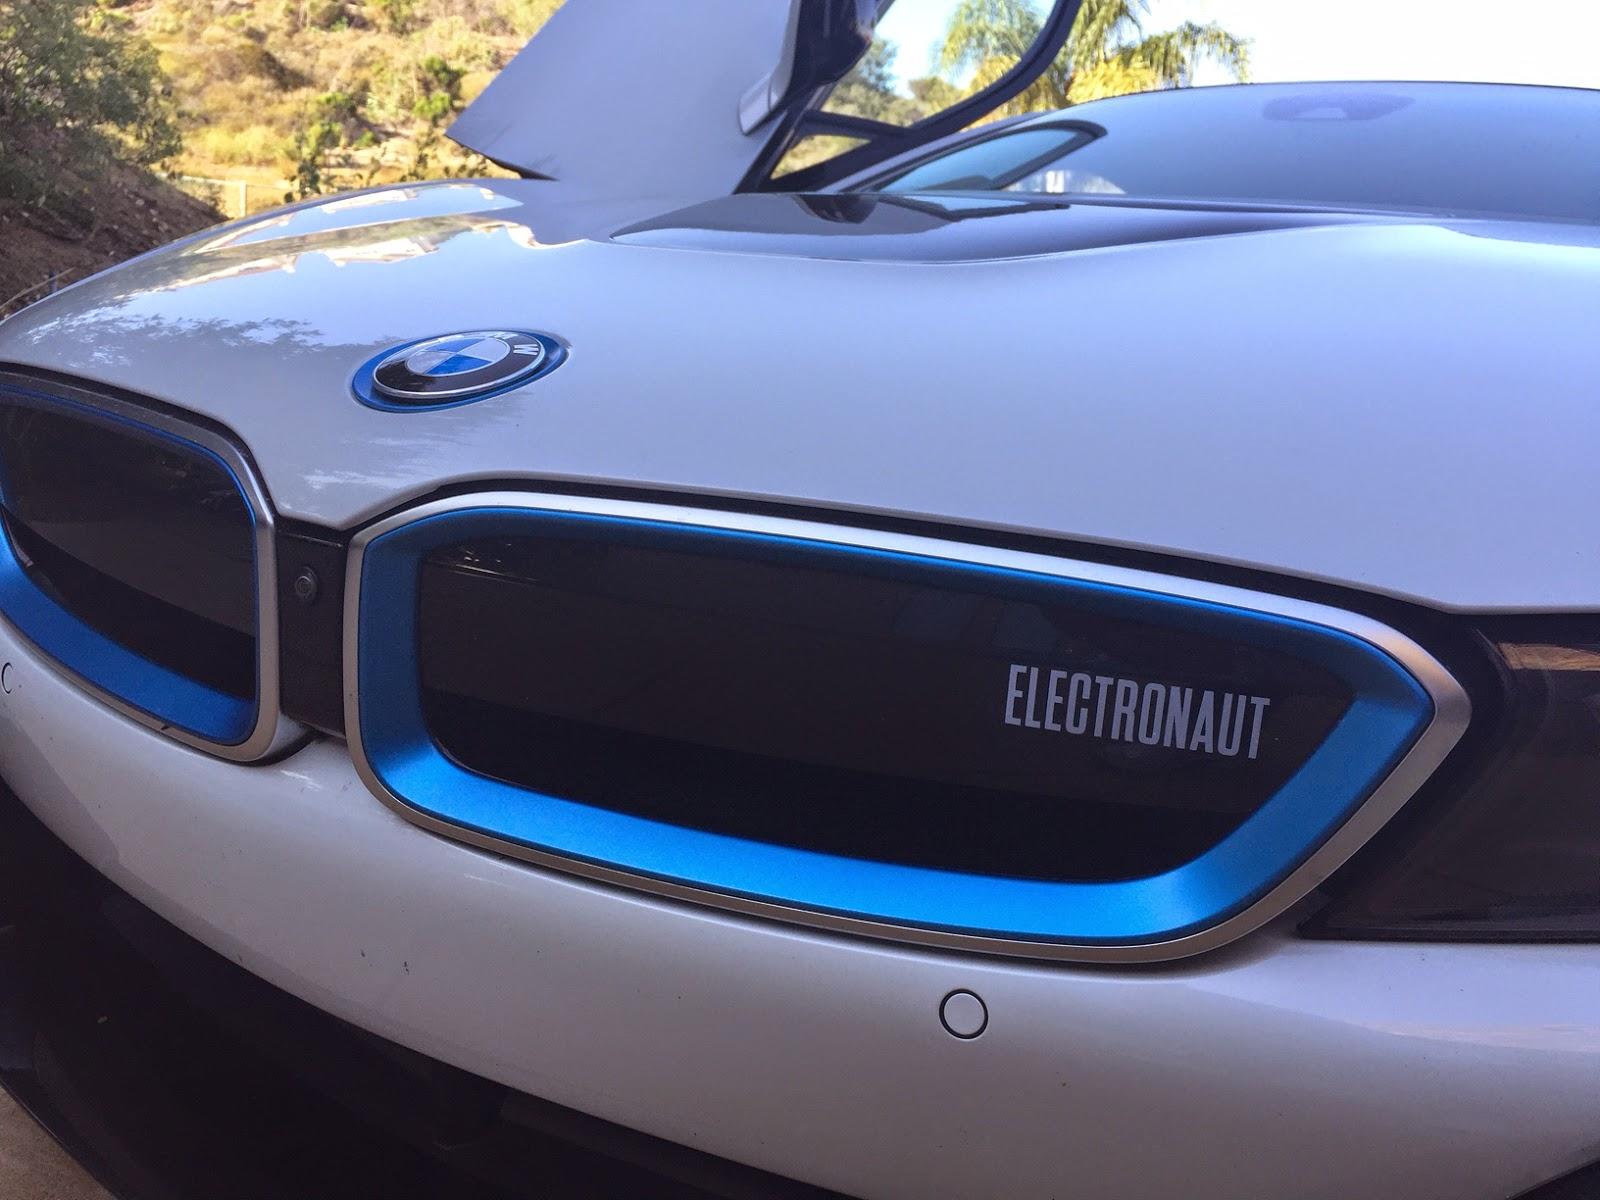 bmw i8 electronaut edition